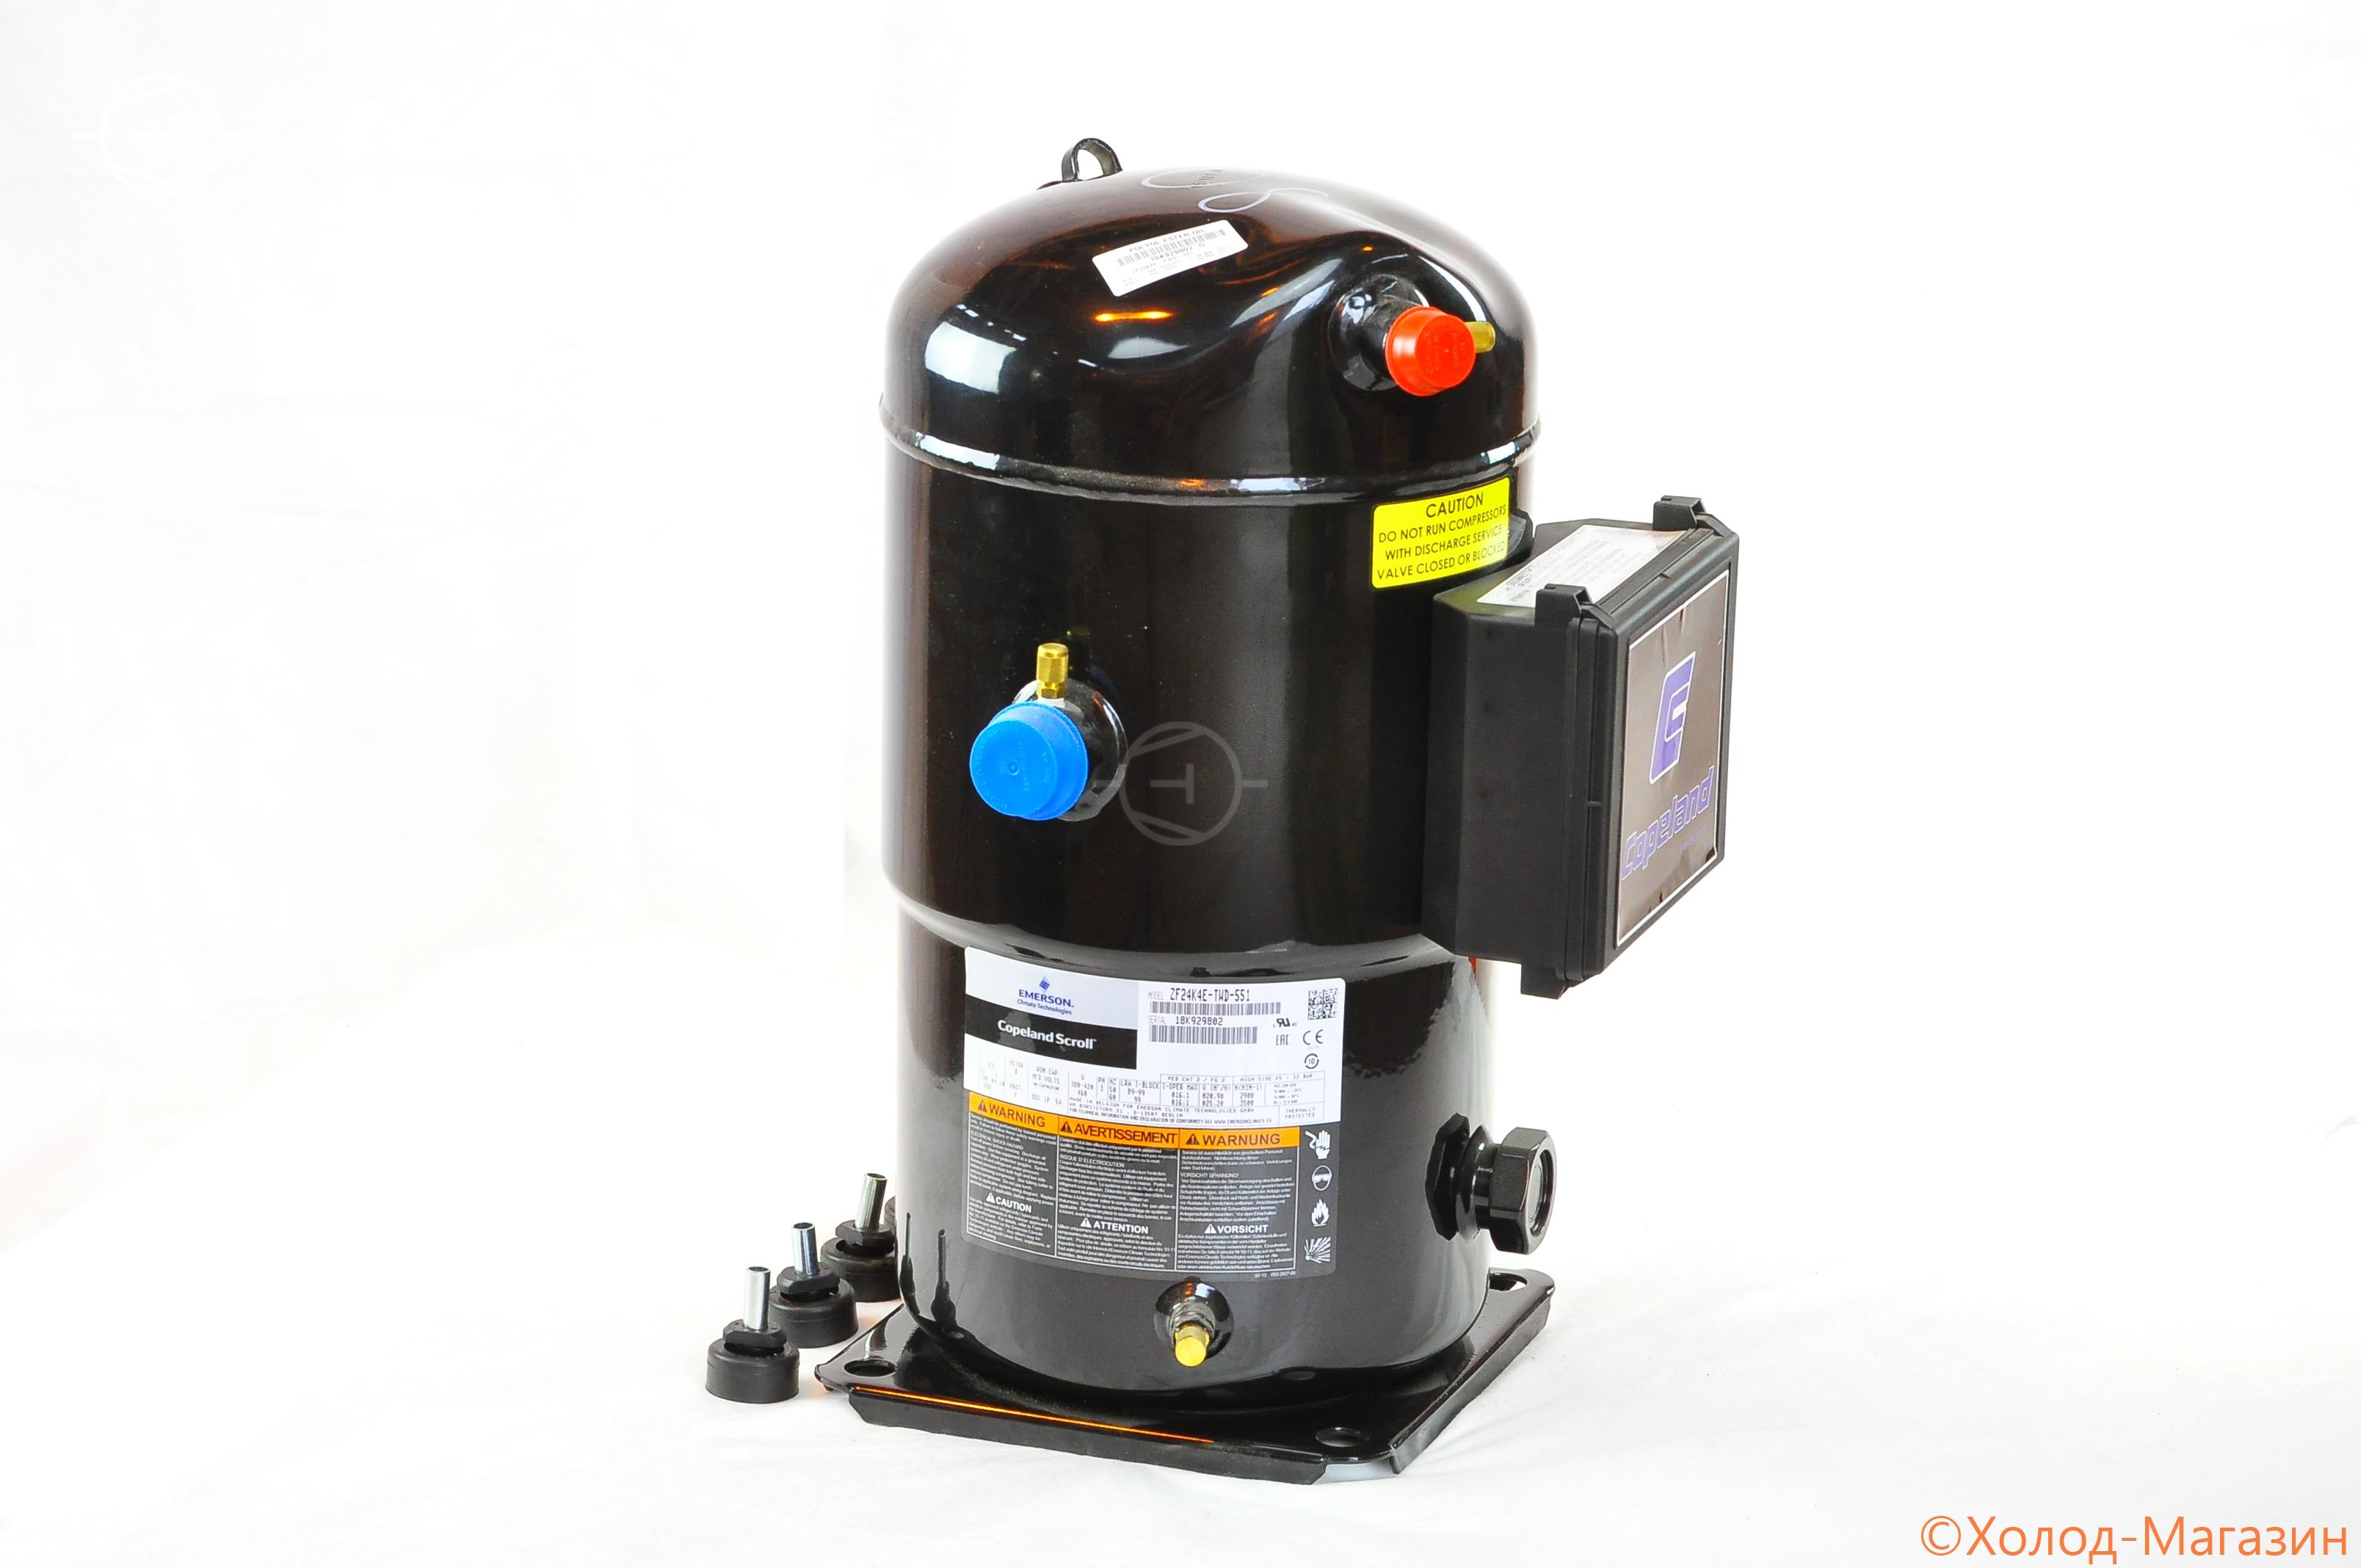 Компрессор спиральный ZF 24 K4E-TWD-551 Copeland, Emerson